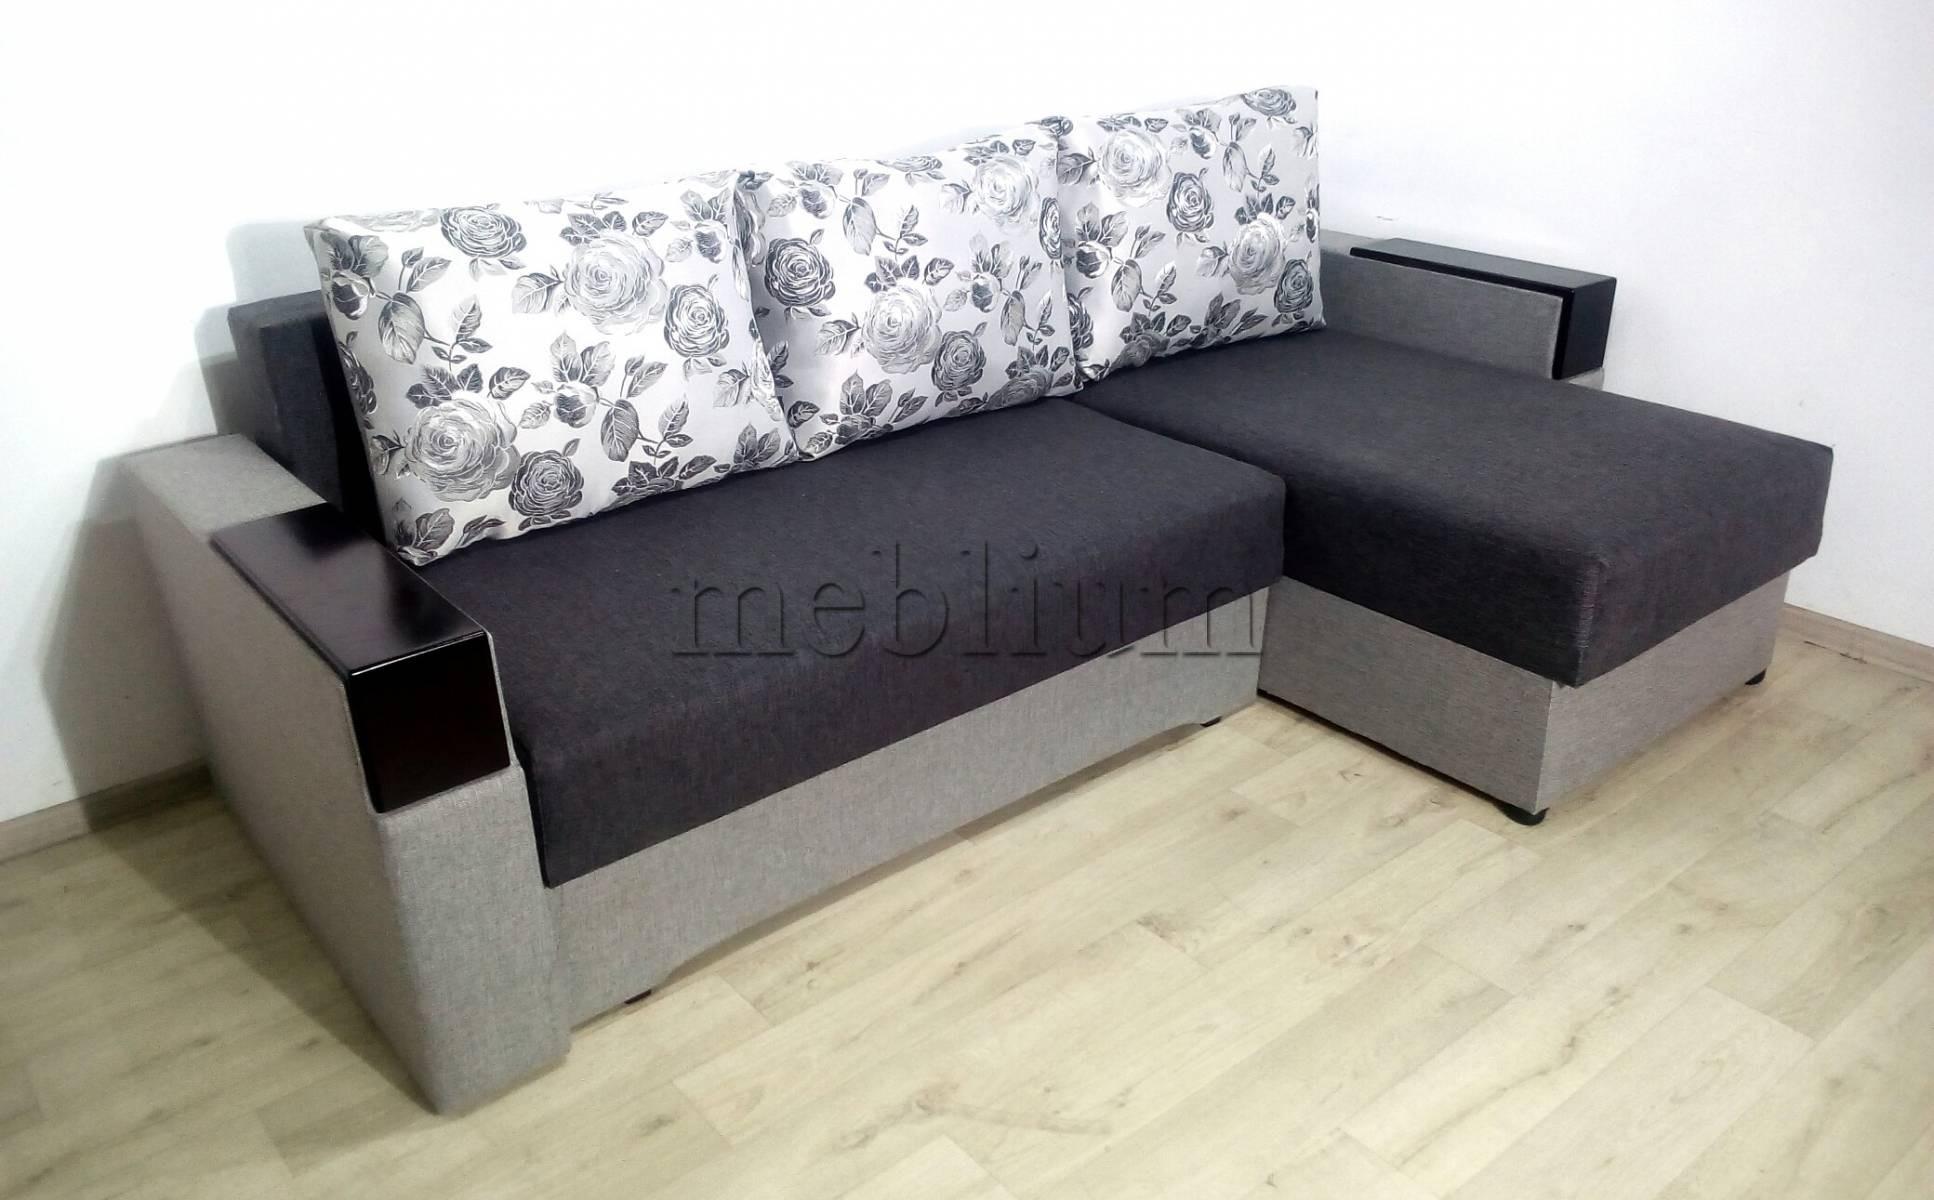 Угловой диван Магнолия универсал -3 Siryj Ткань: Siryj 3